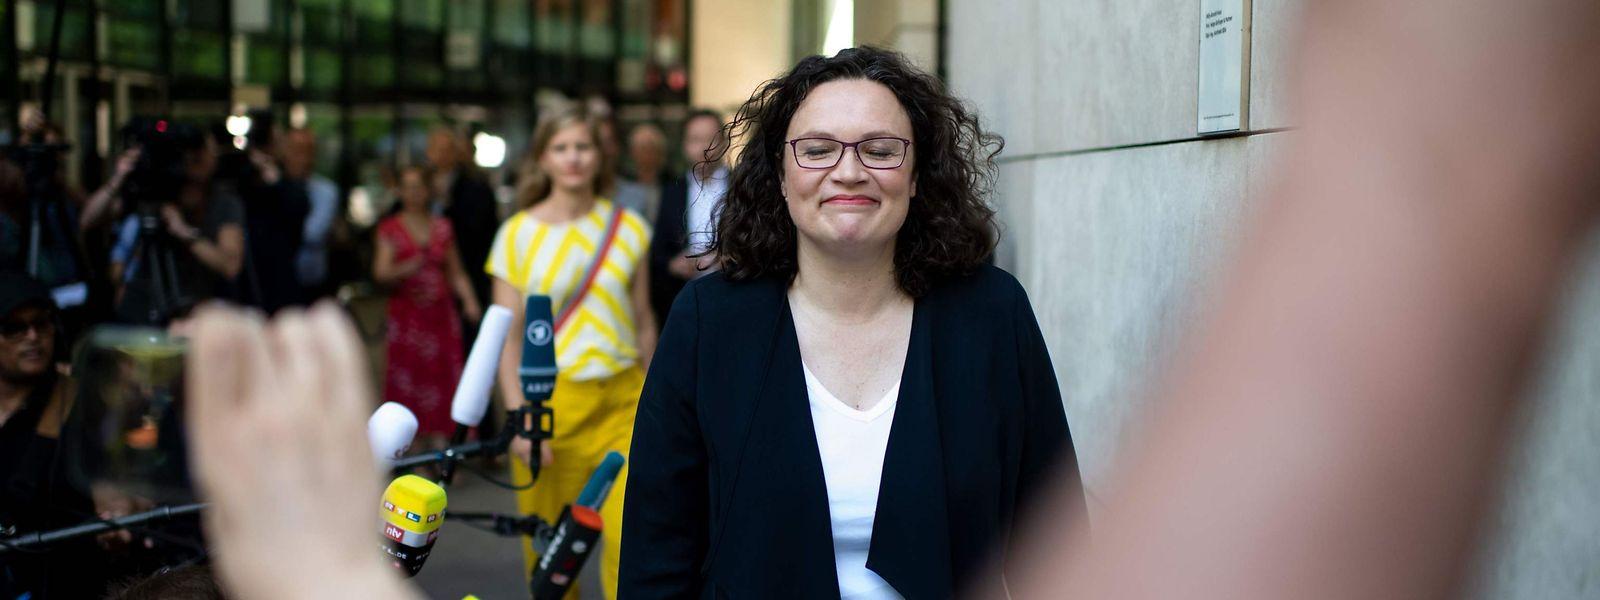 Der Umgang mit der SPD-Vorsitzenden Andrea Nahles war erbärmlich.